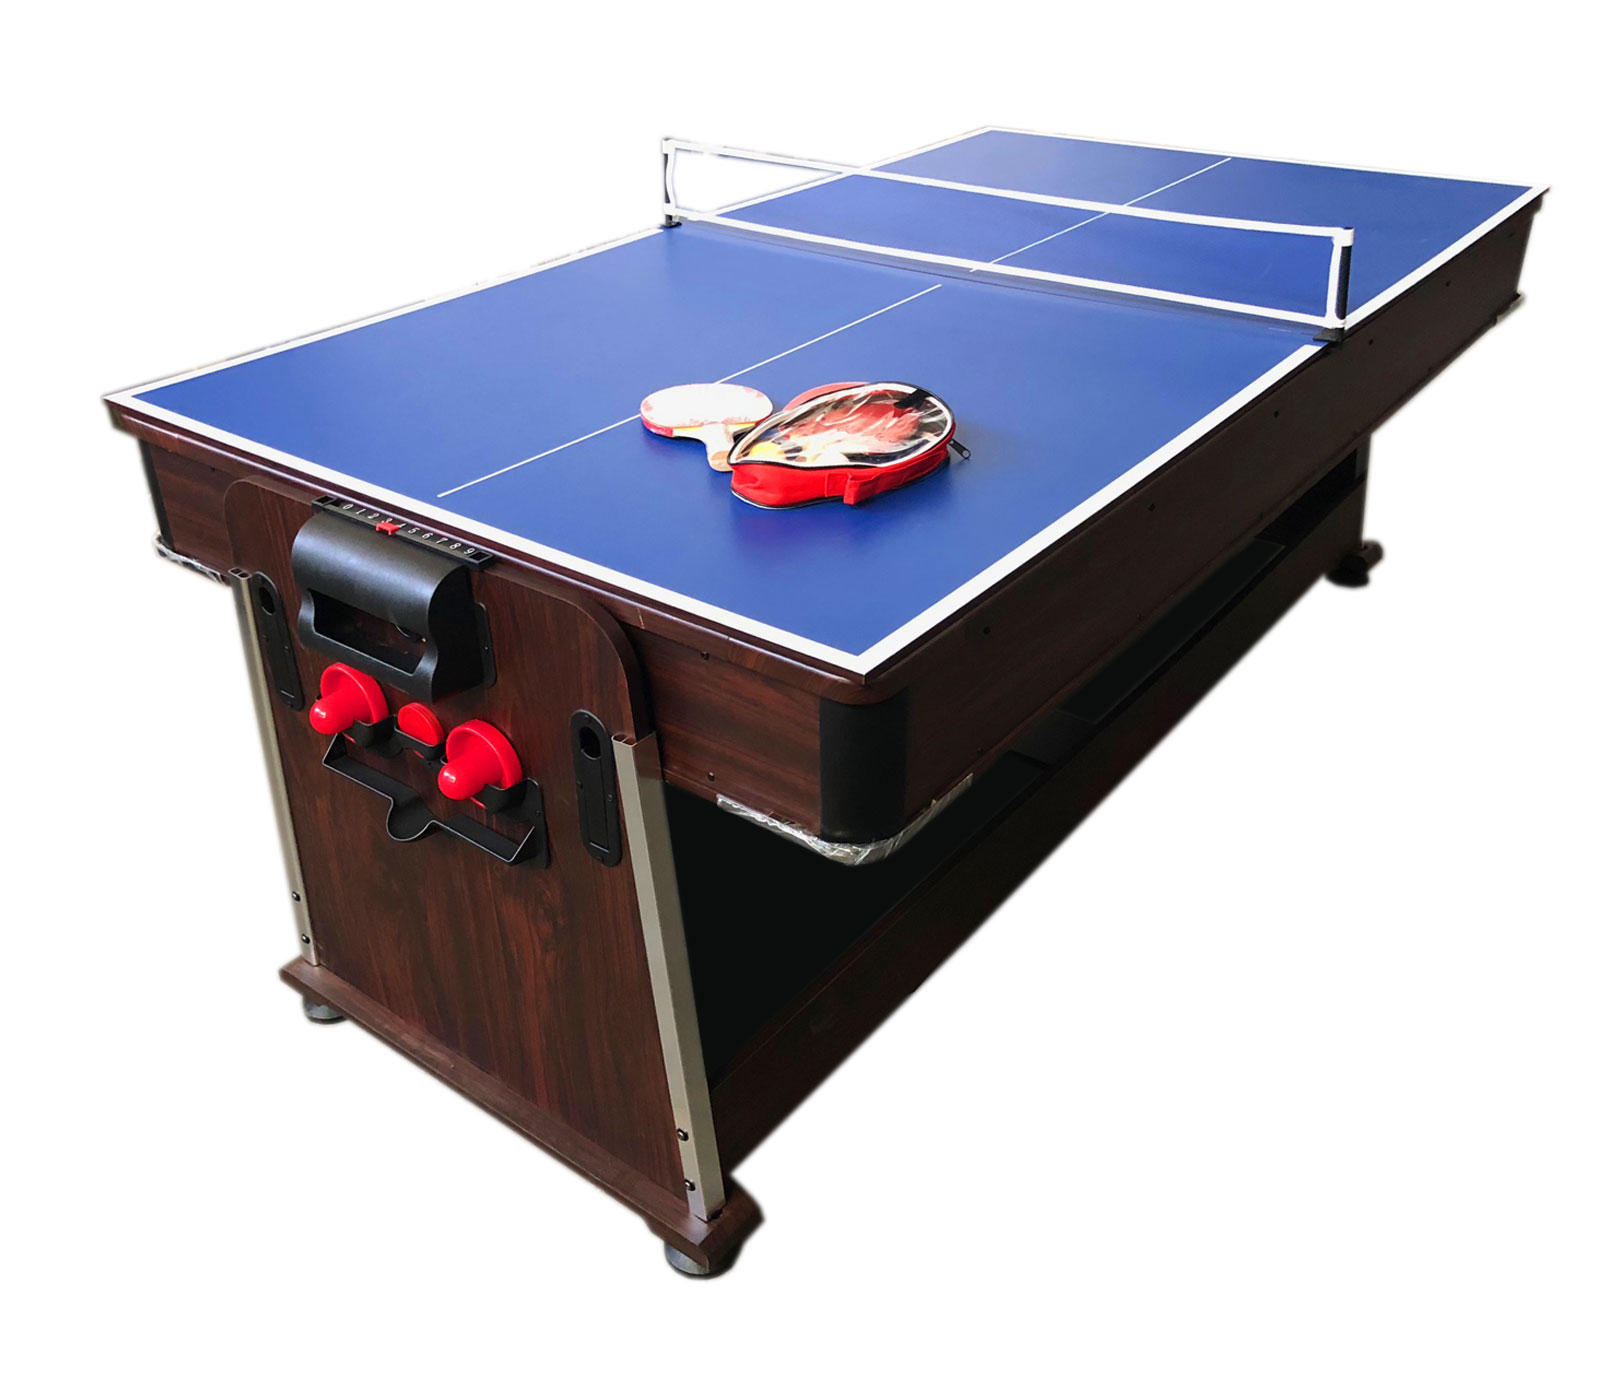 Tavolo Da Biliardo 7 Piedi Air Hockey Ping Pong Tavolo Da Pranzo Mattew